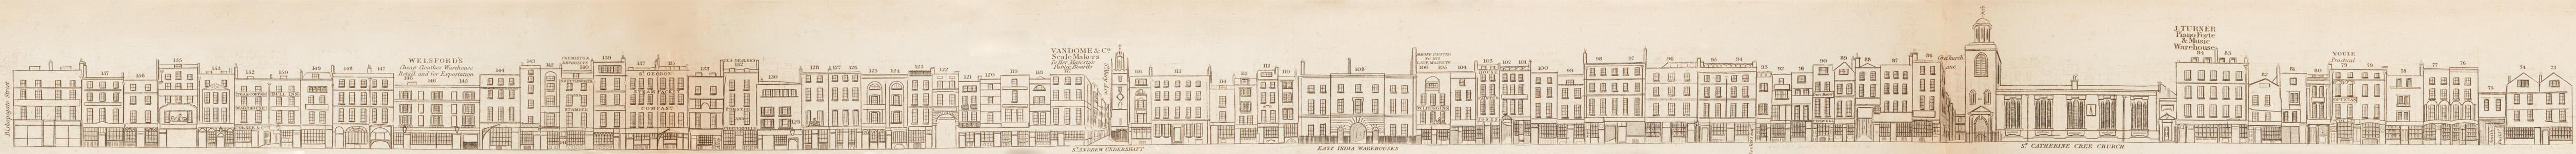 map - Tallis's London street views : No. 2. Leadenhall Street (north)